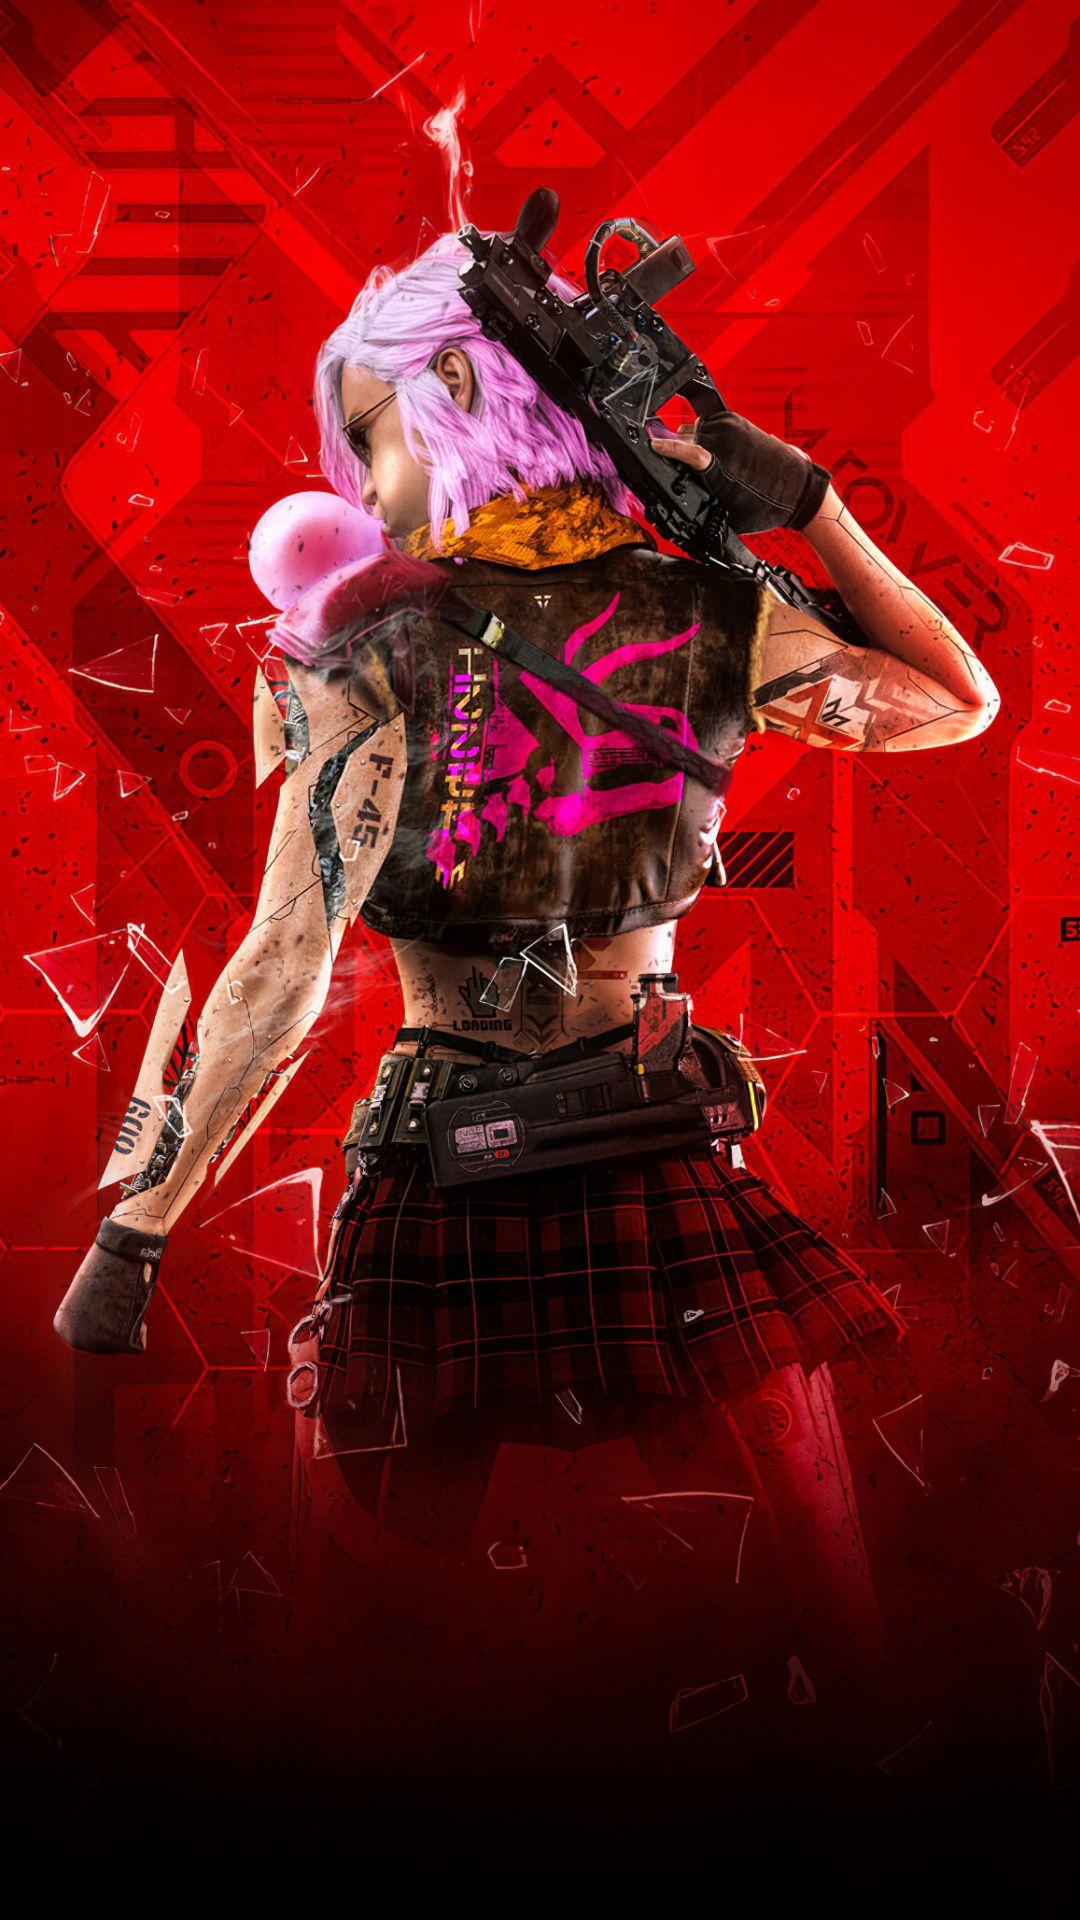 1080x1920 Cyberpunk girl, video game, art wallpaper in